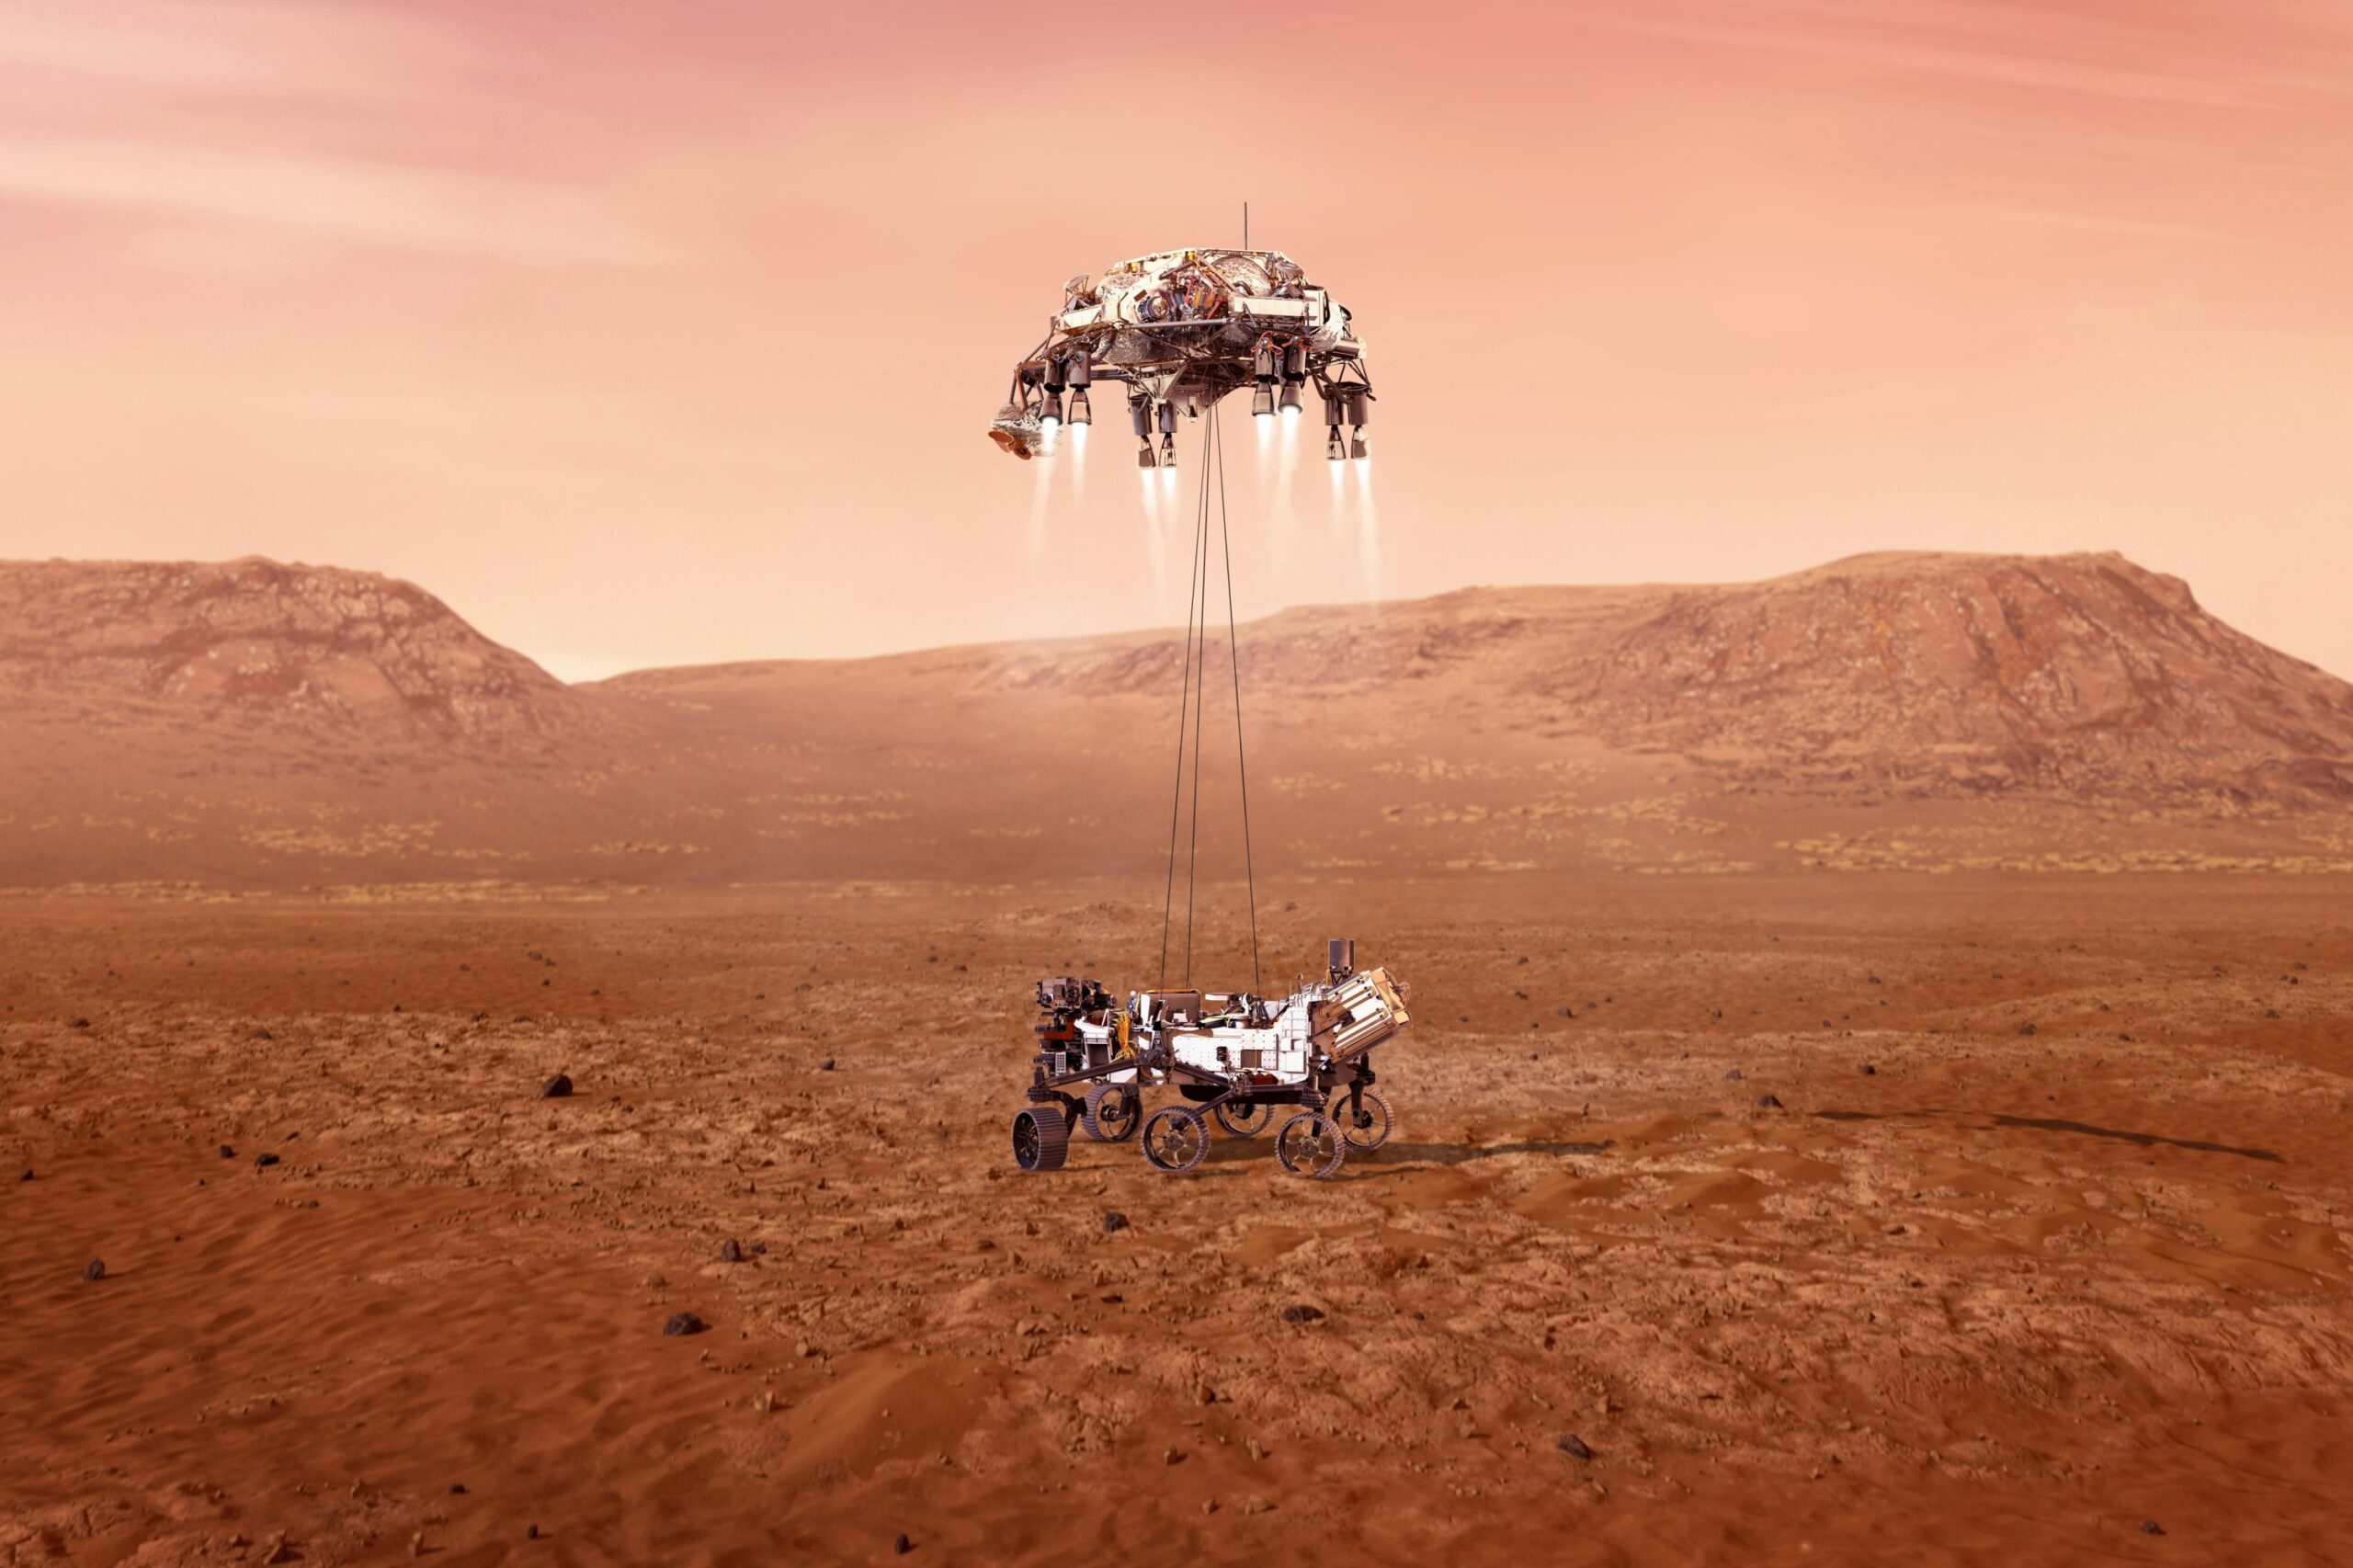 Artist's rendition of NASA's Perseverance rover landing on Mars beneath its skycrane